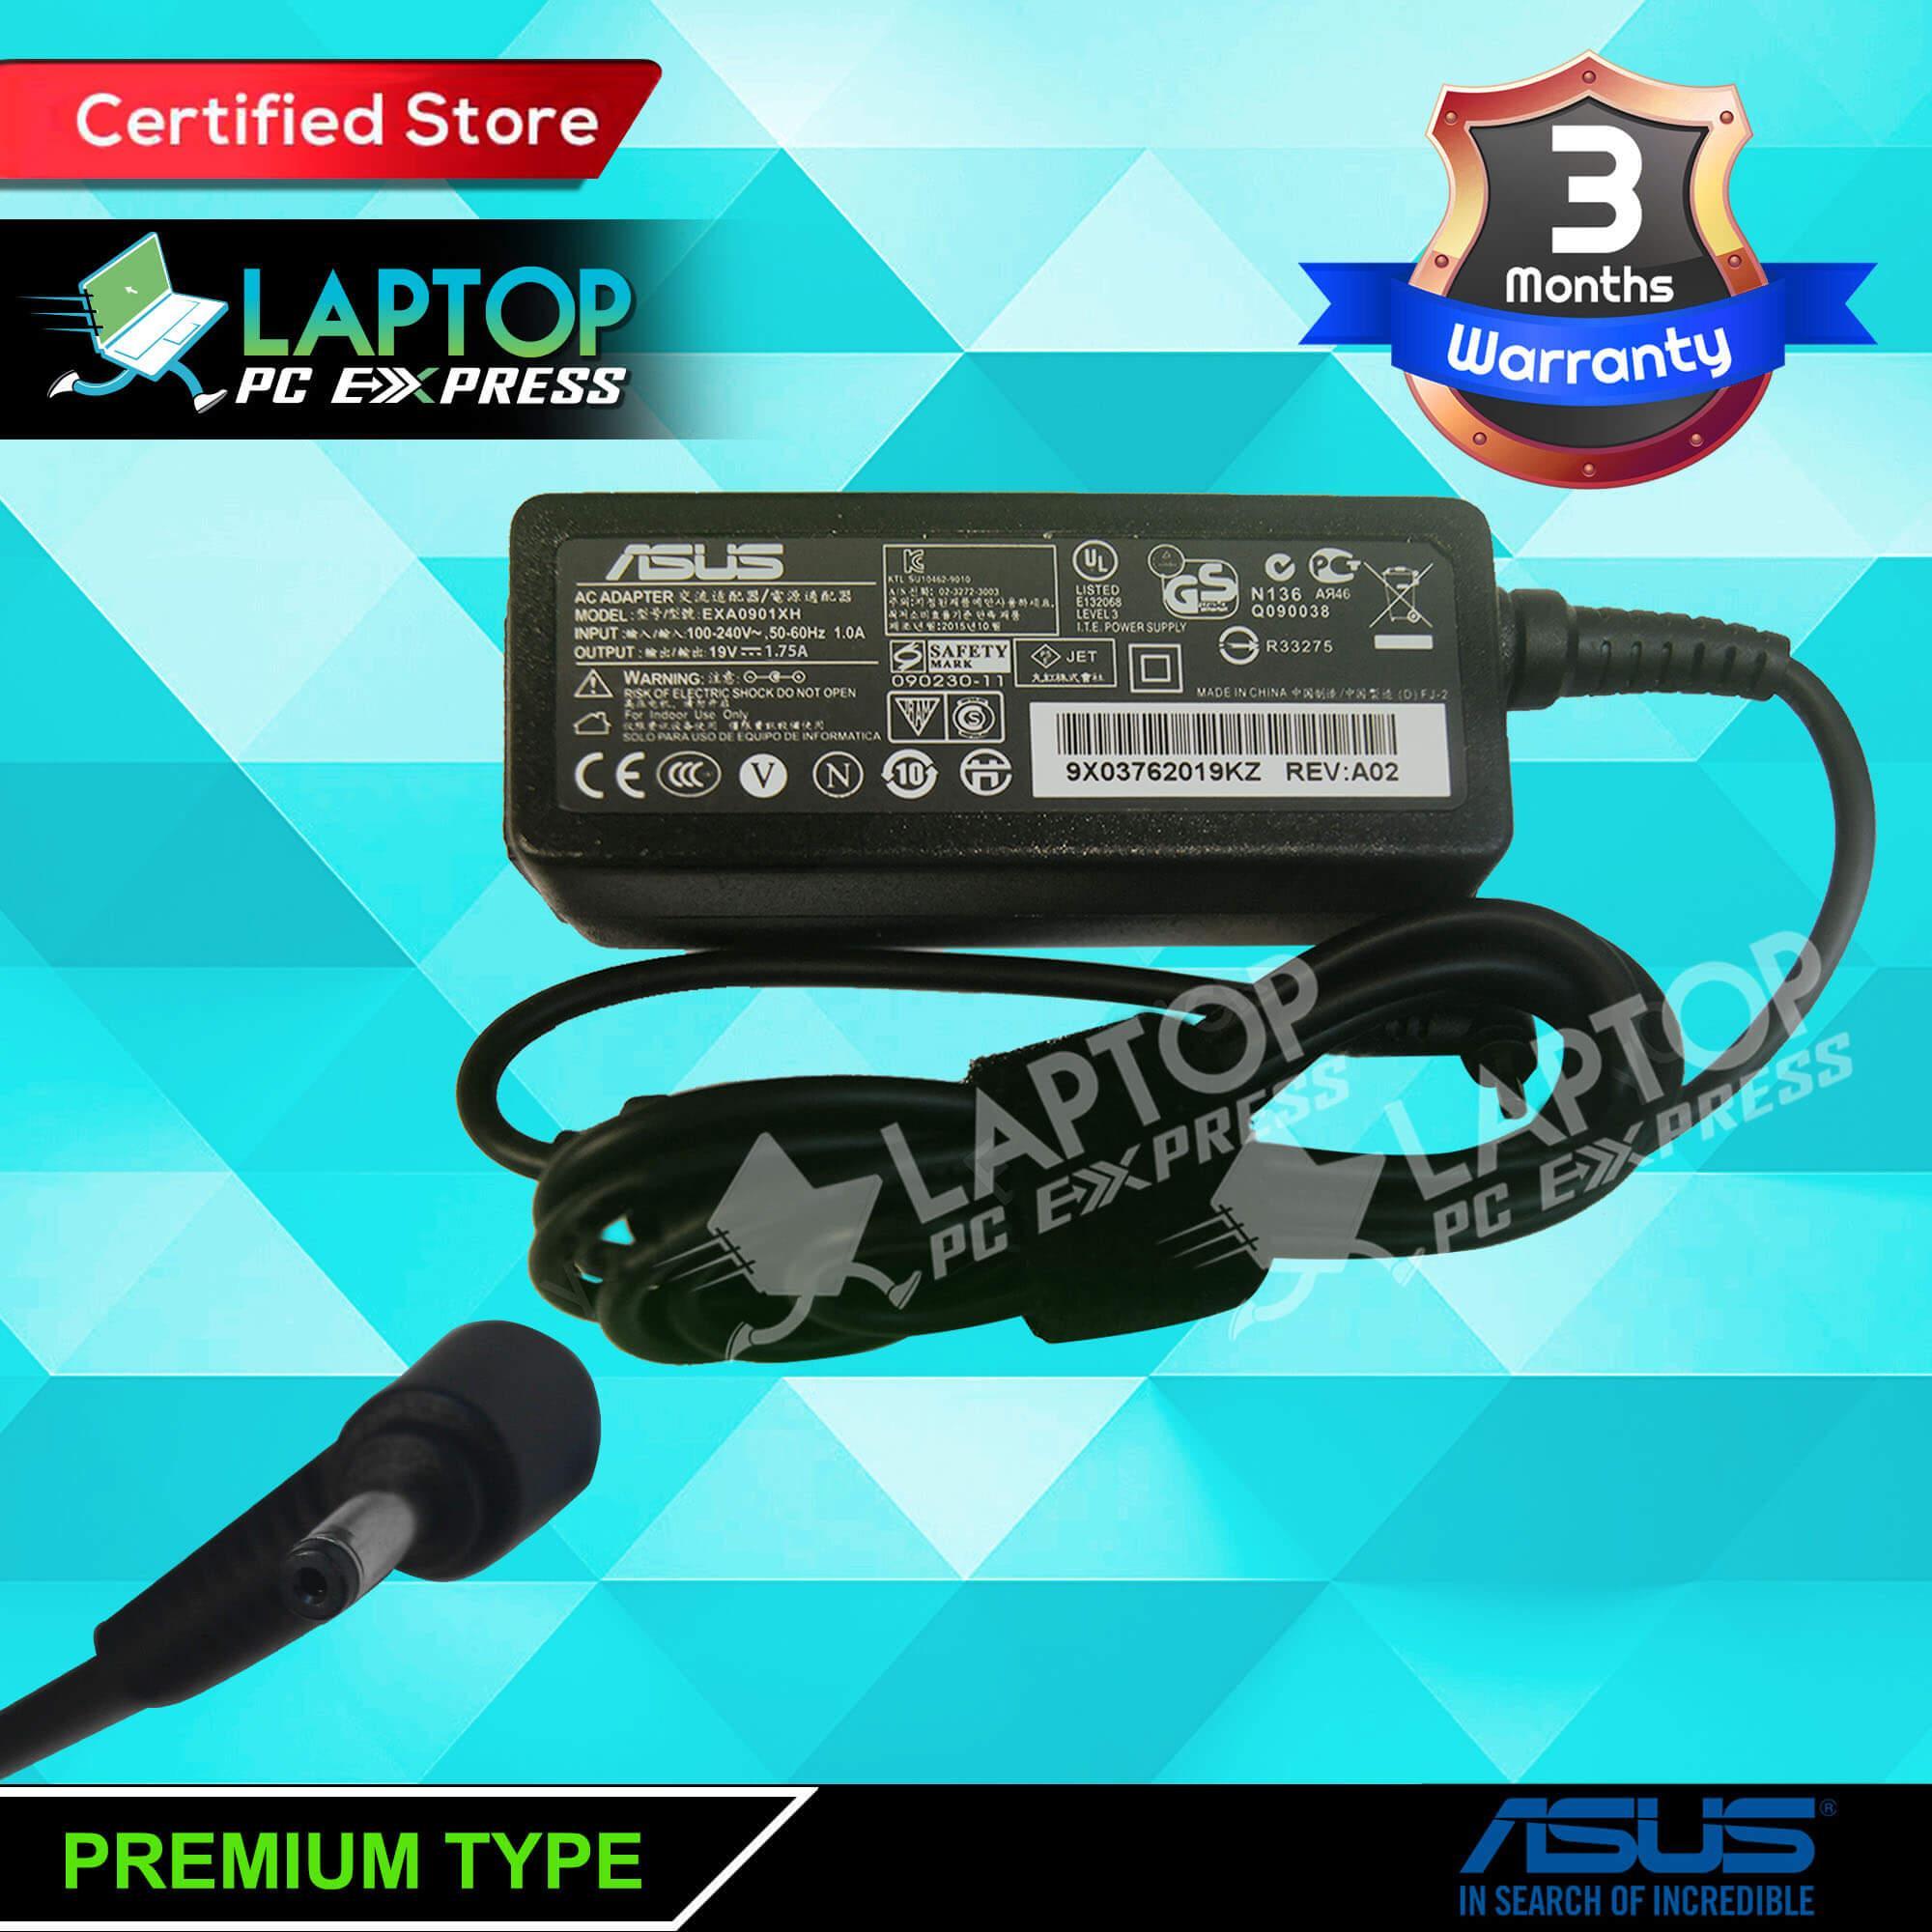 Asus Computer Accessories Philippines Pc For Sale Charger Desktop Lf Laptop 19v 175a 40mm X 135mm X453 X453m X403m X553m